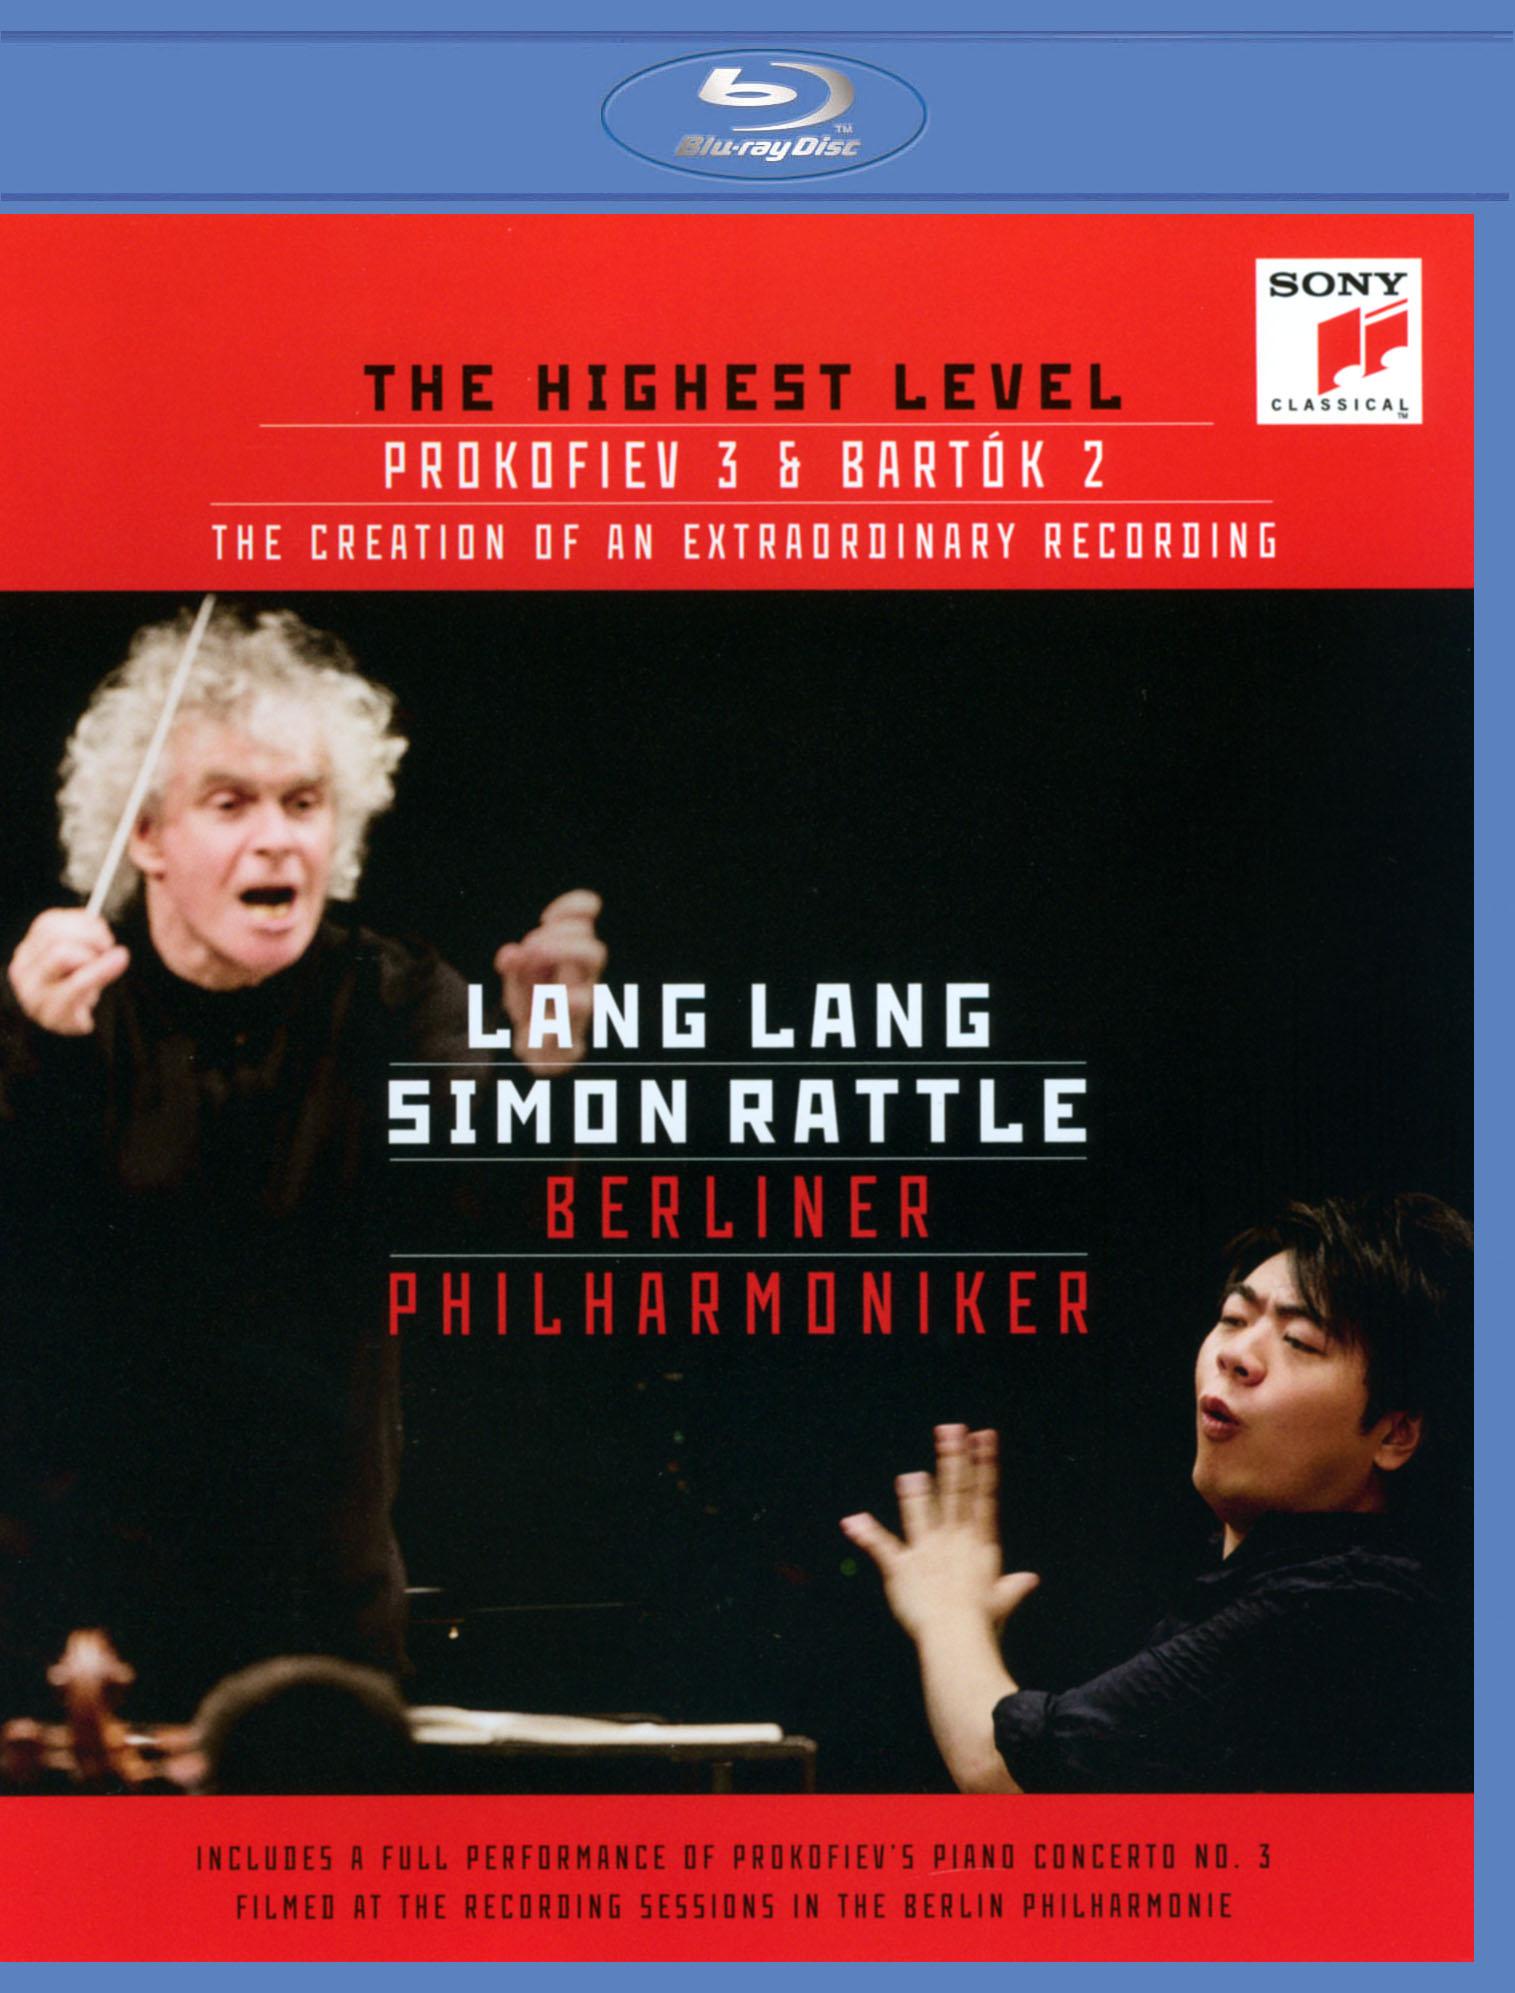 Lang Lang/Simon Rattle/Berliner Philharmoniker: The Highest Level - Prokofiev 3 and Bartok 2